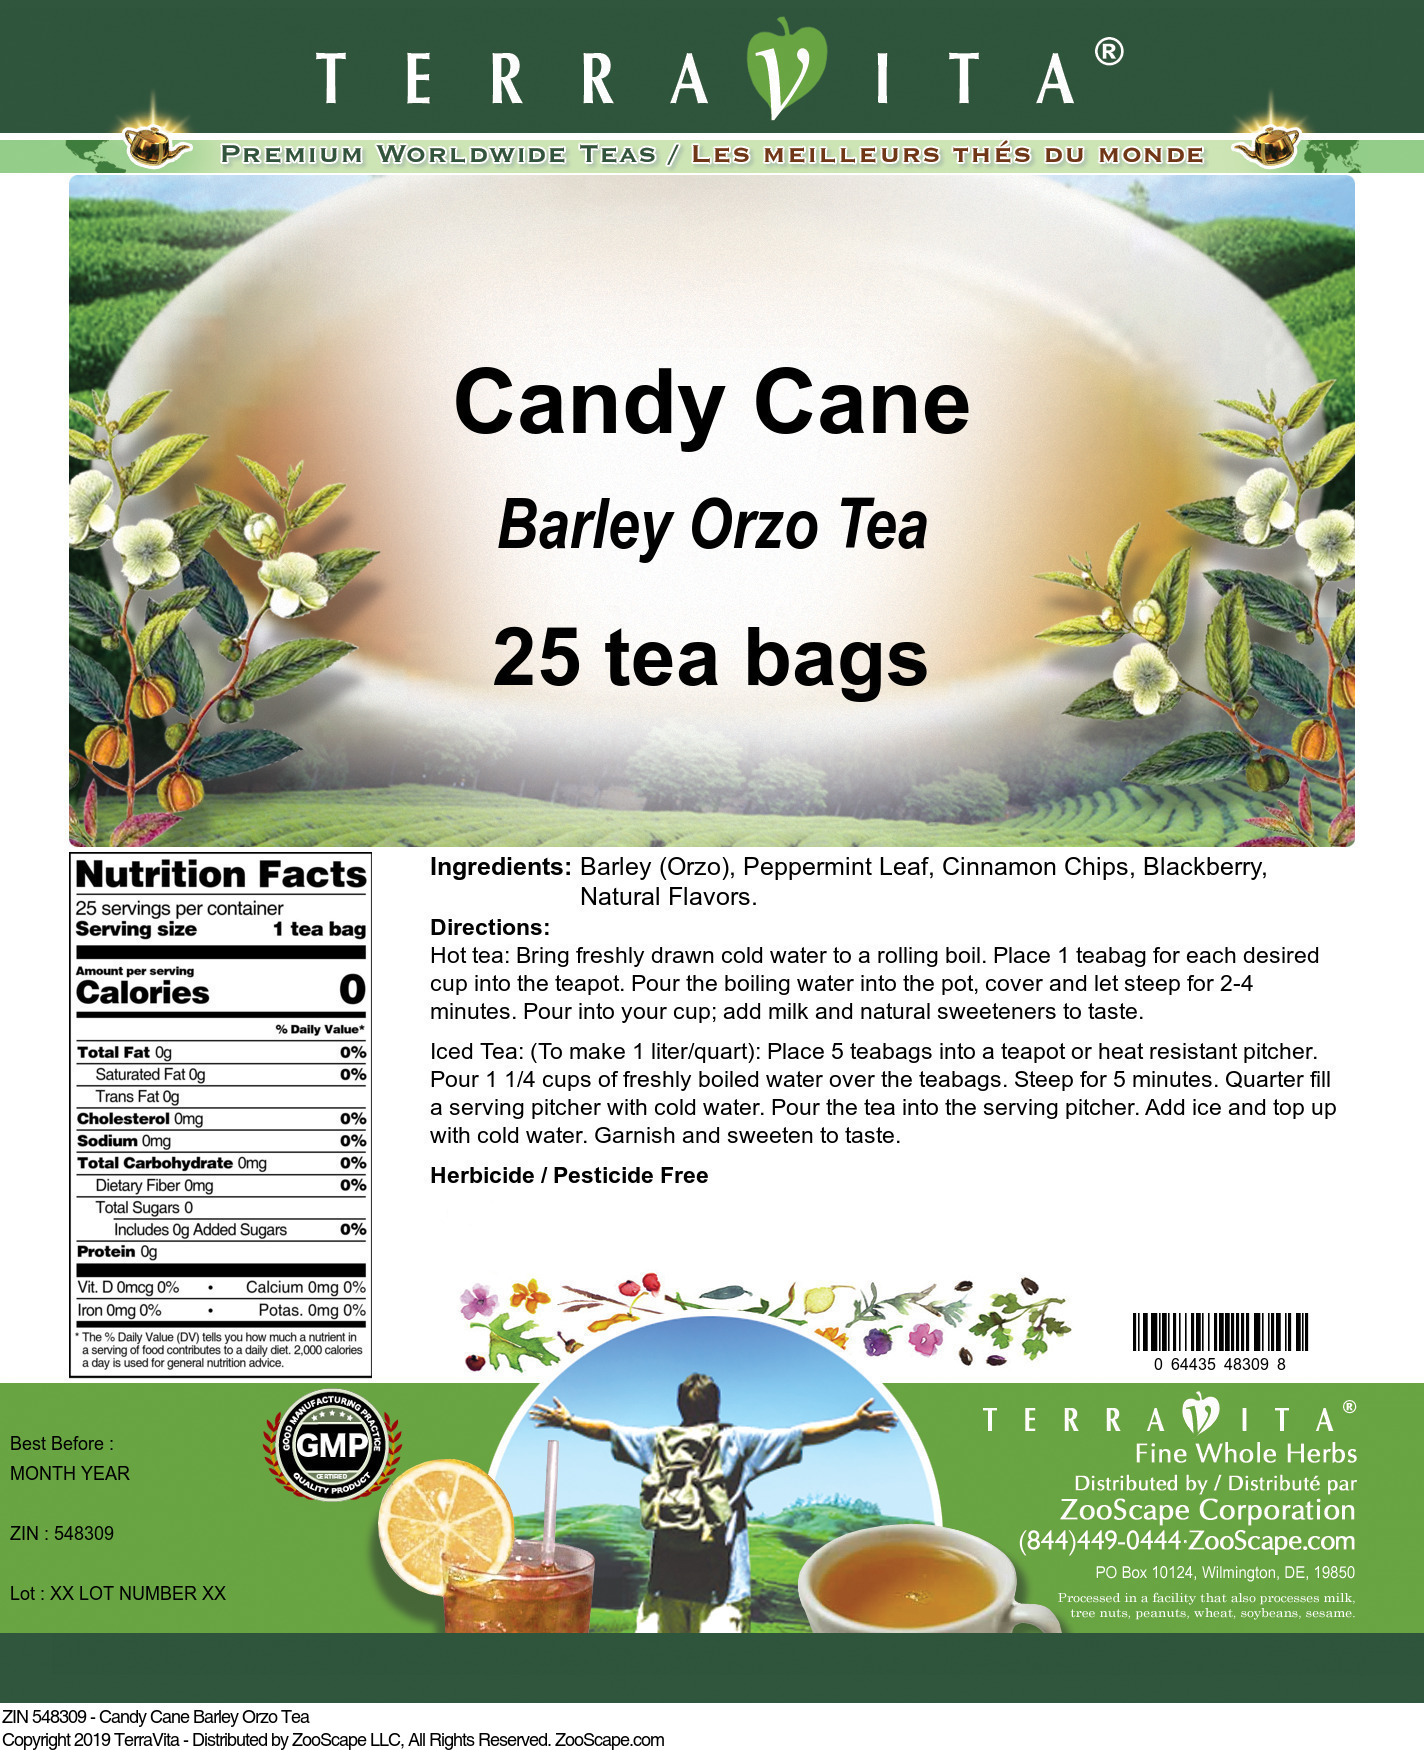 Candy Cane Barley Orzo